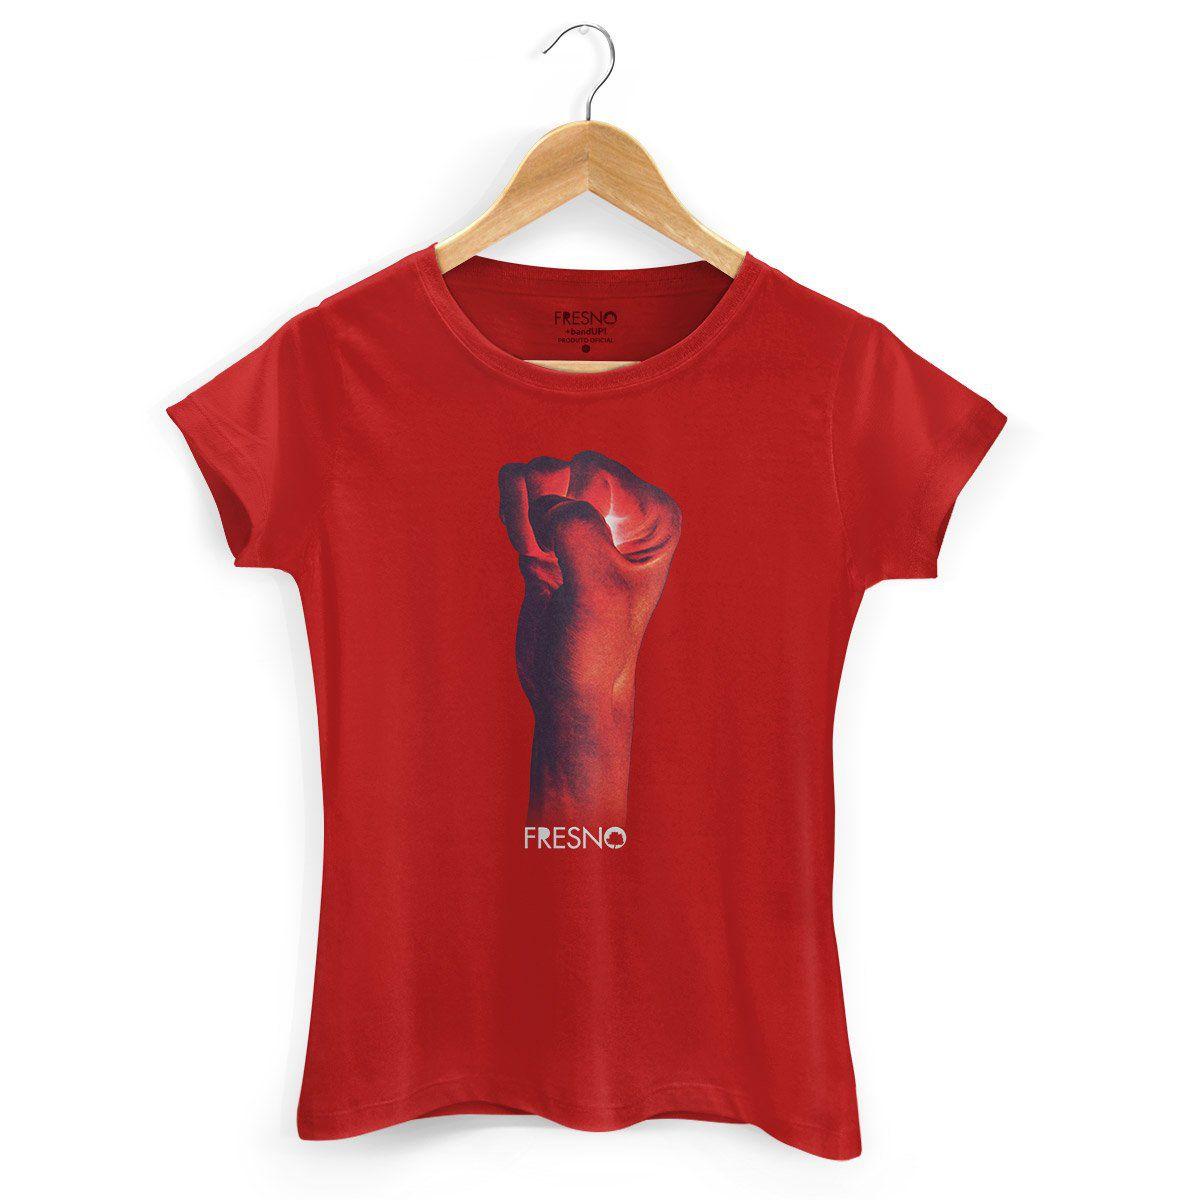 Camiseta Feminina Fresno - Manifesto